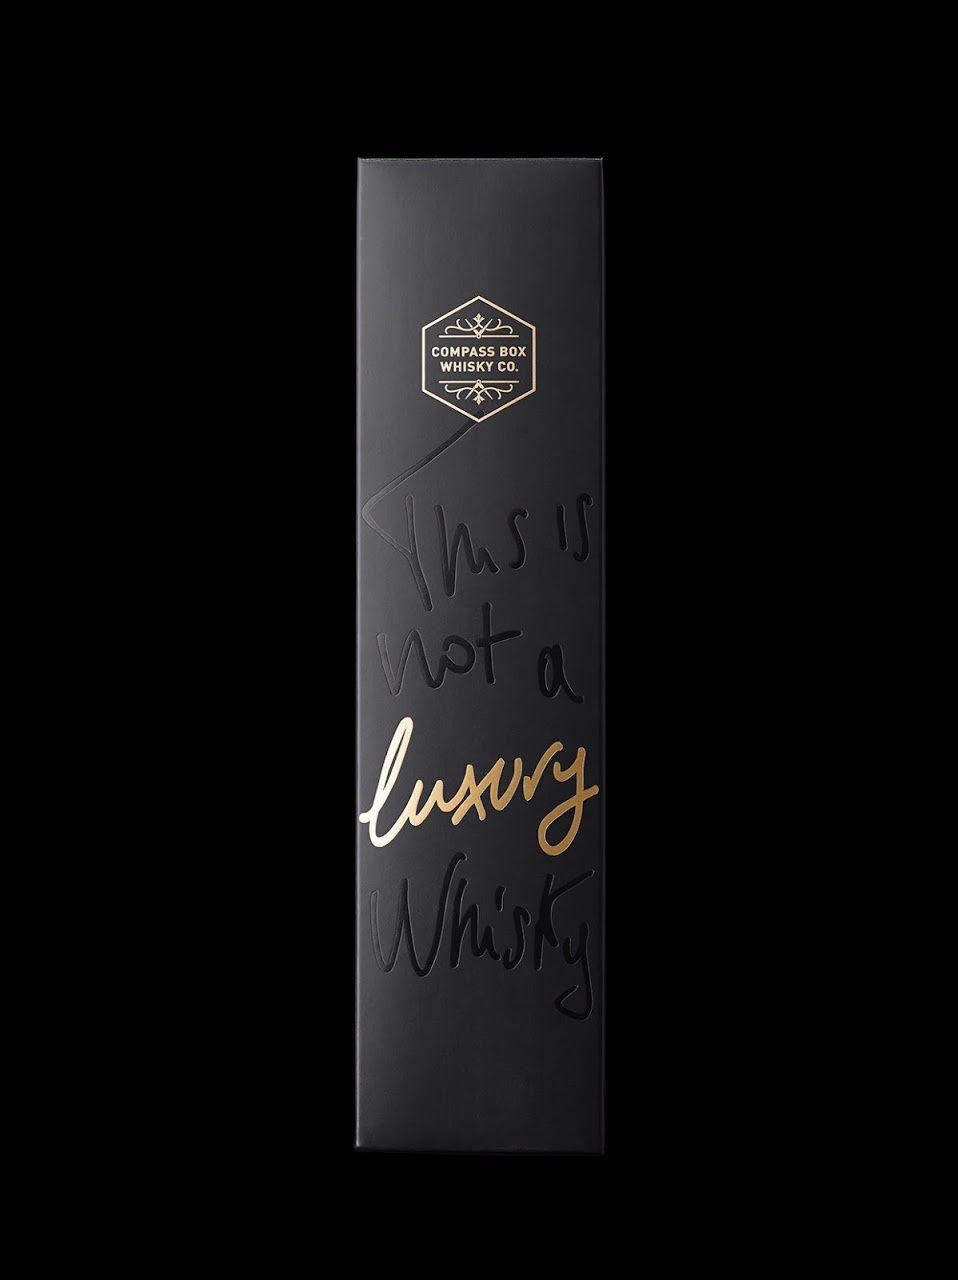 This is not a Luxury Whisky… or is it ? (whisky) | Design : Stranger & Stranger, New-York, Etats-Unis (novembre 2015)